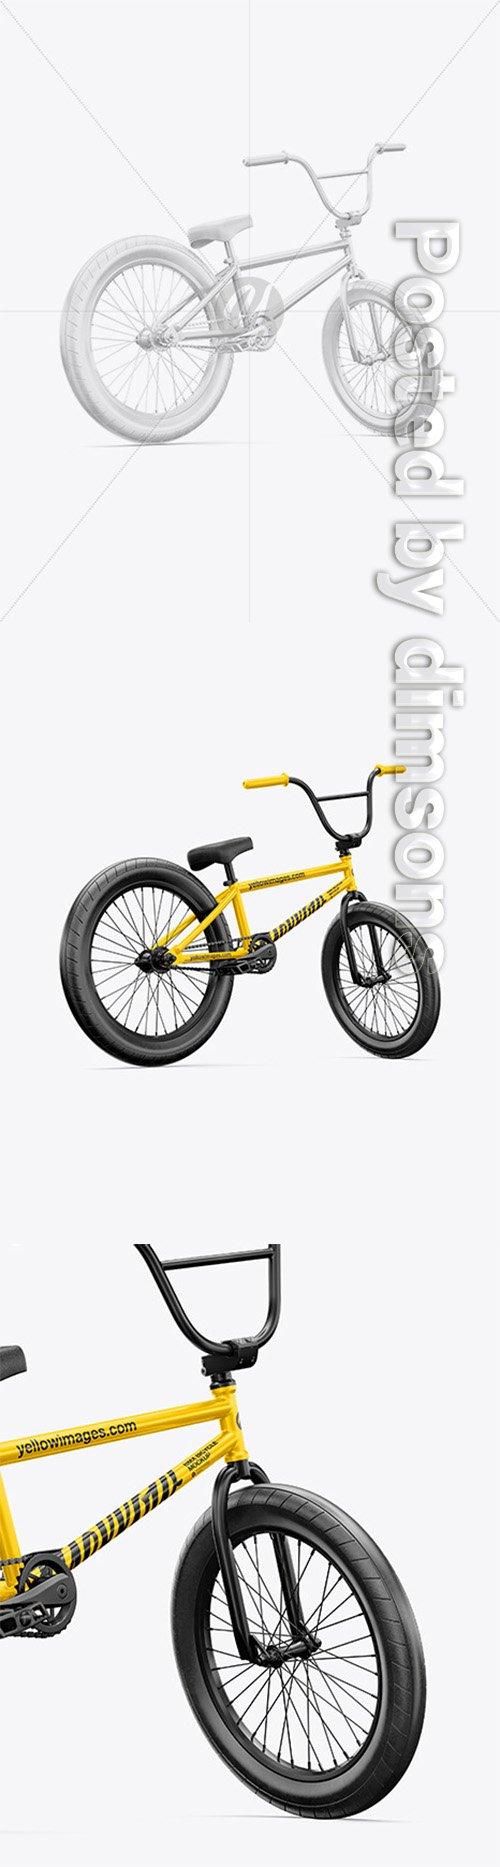 BMX Bicycle Mockup - Back Half Side View 65085 TIF